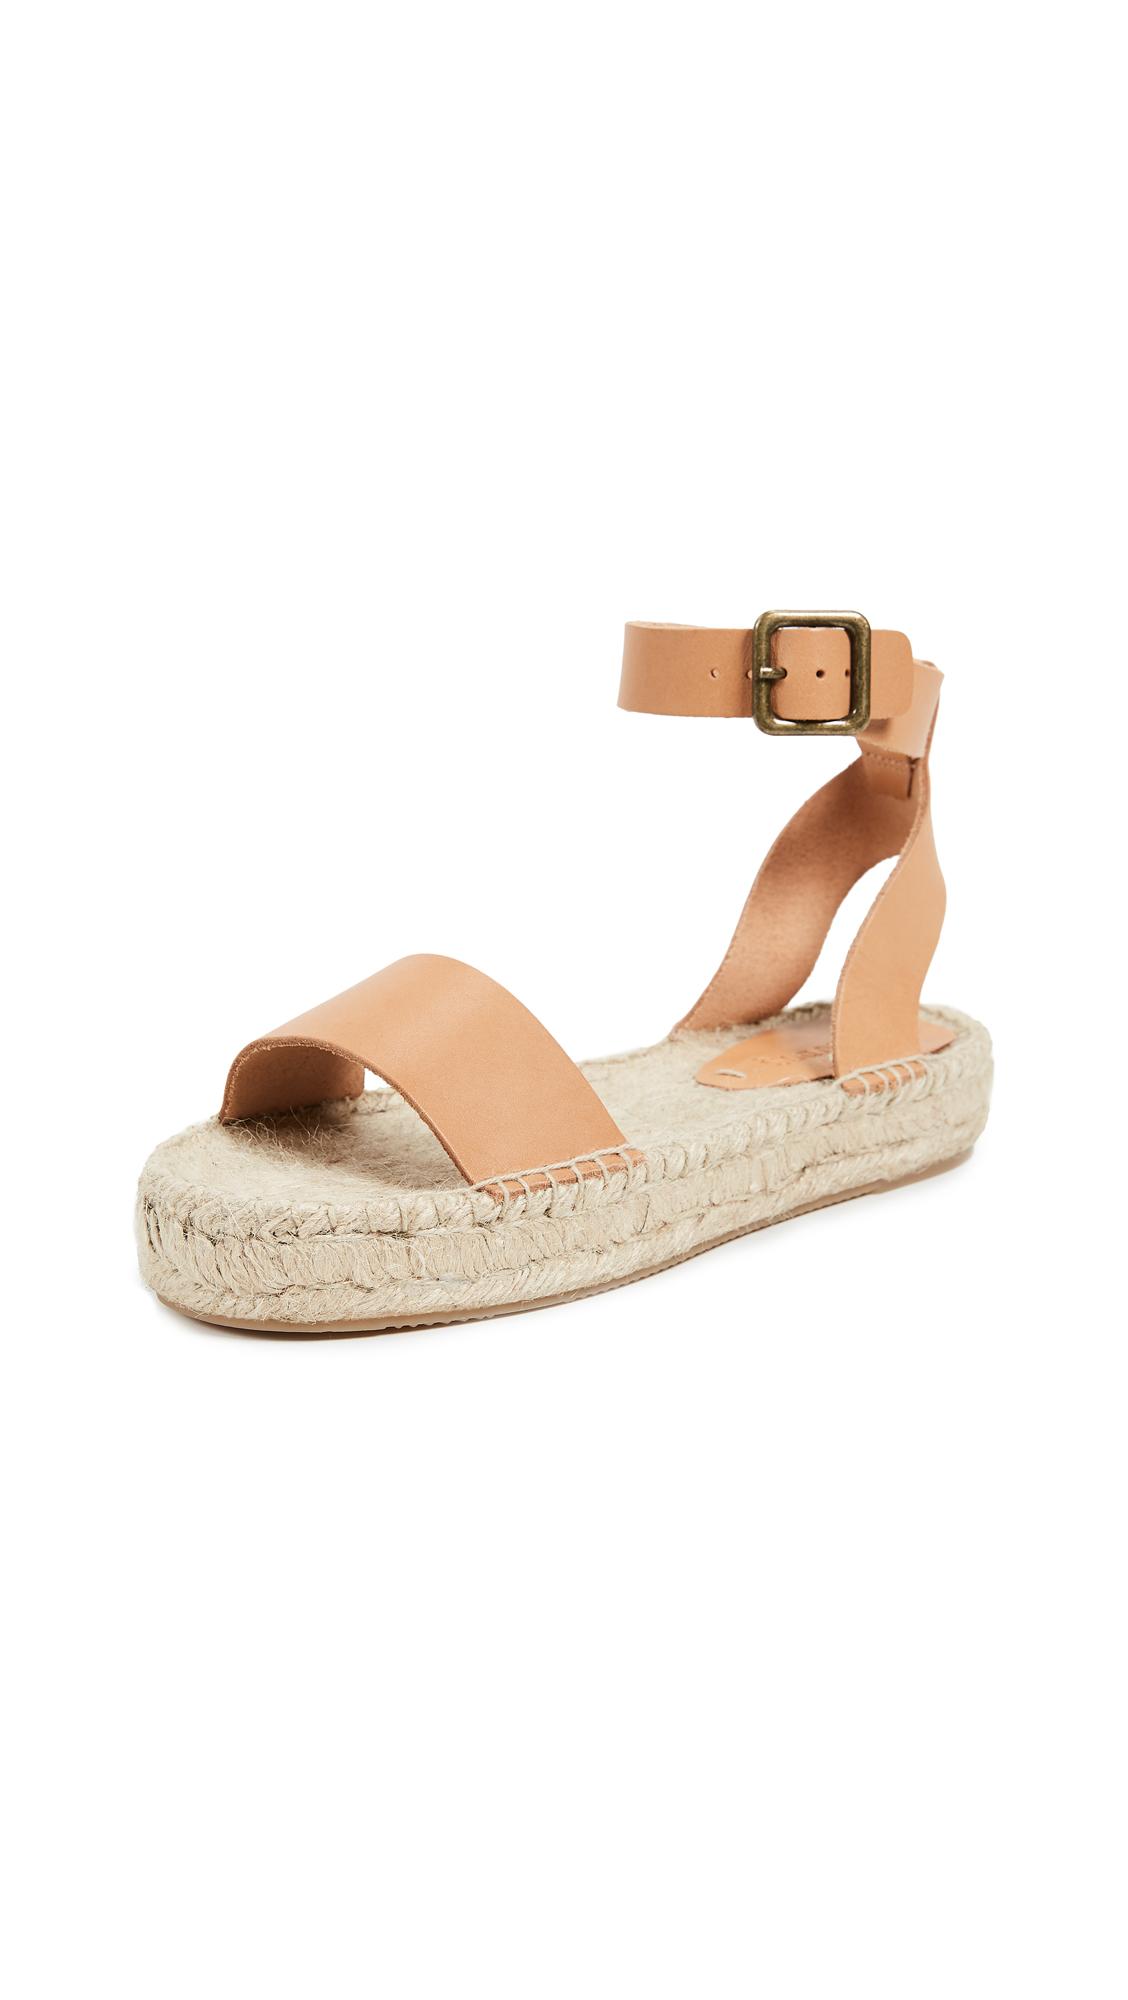 Soludos Cadiz Sandals In Nude